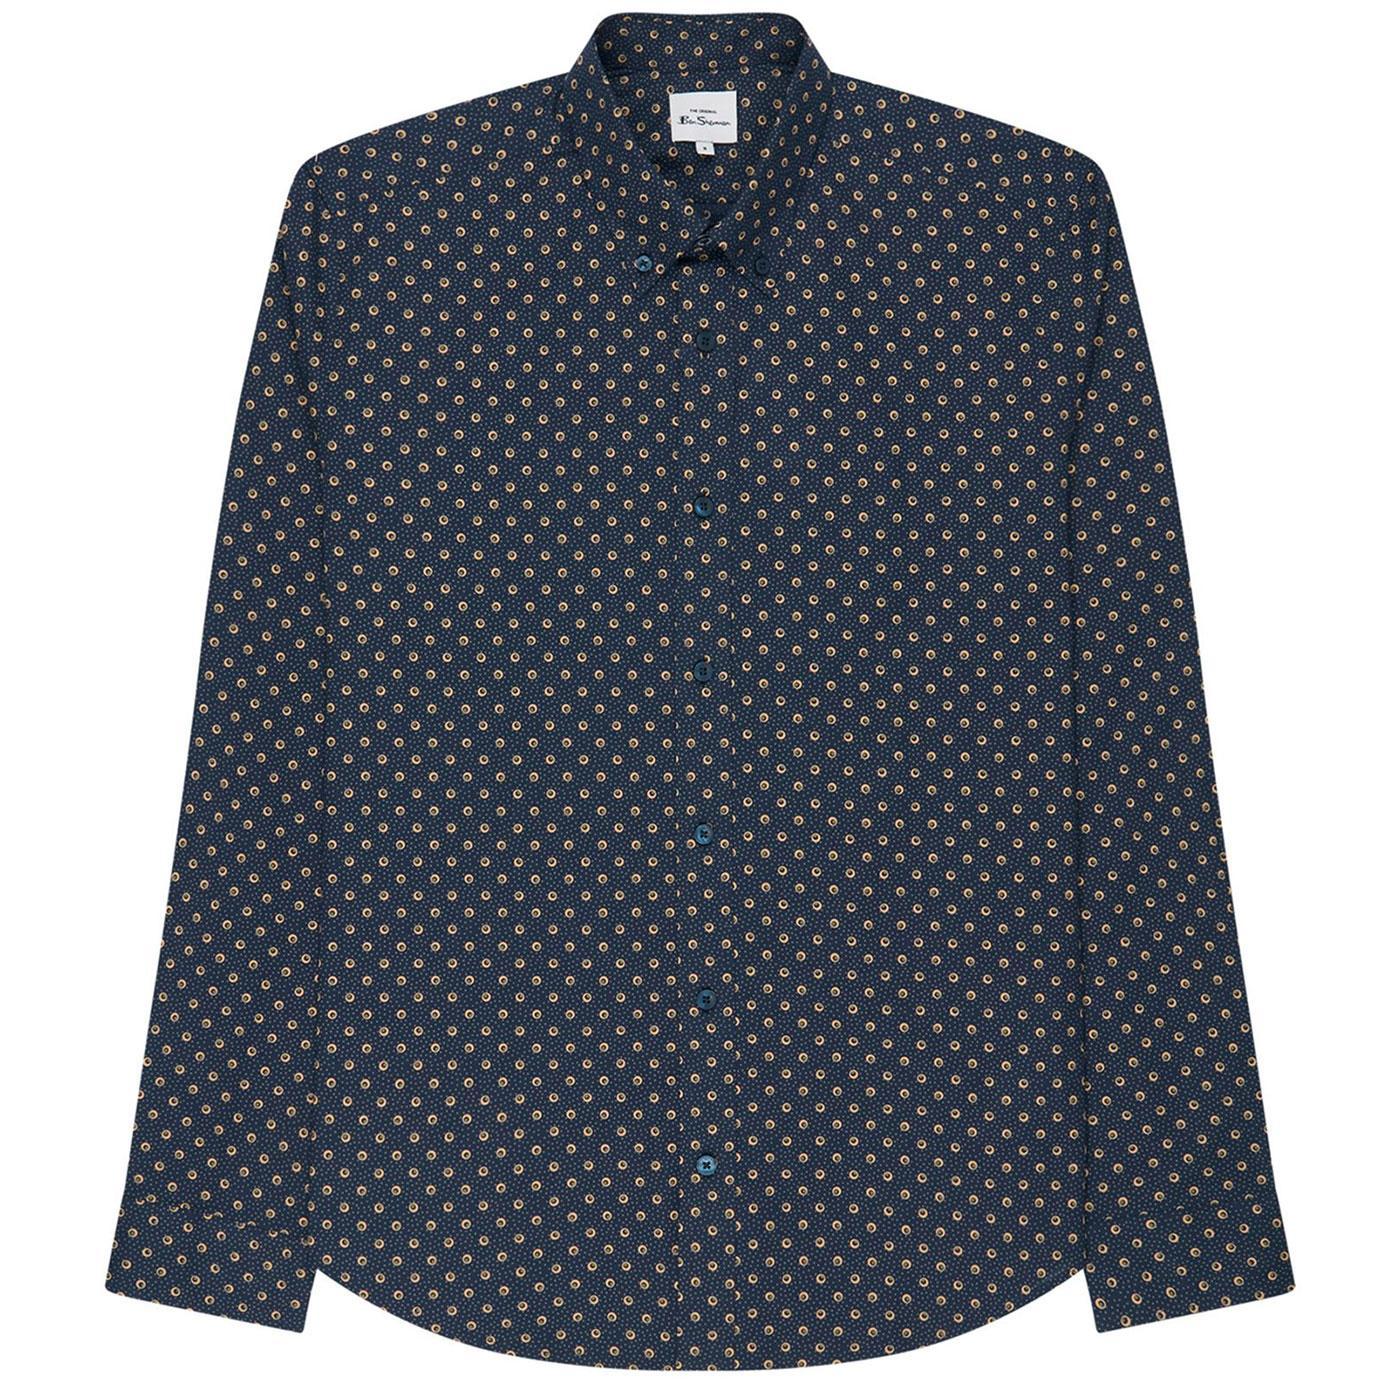 BEN SHERMAN Retro Mod 70s Mini Target Spot Shirt